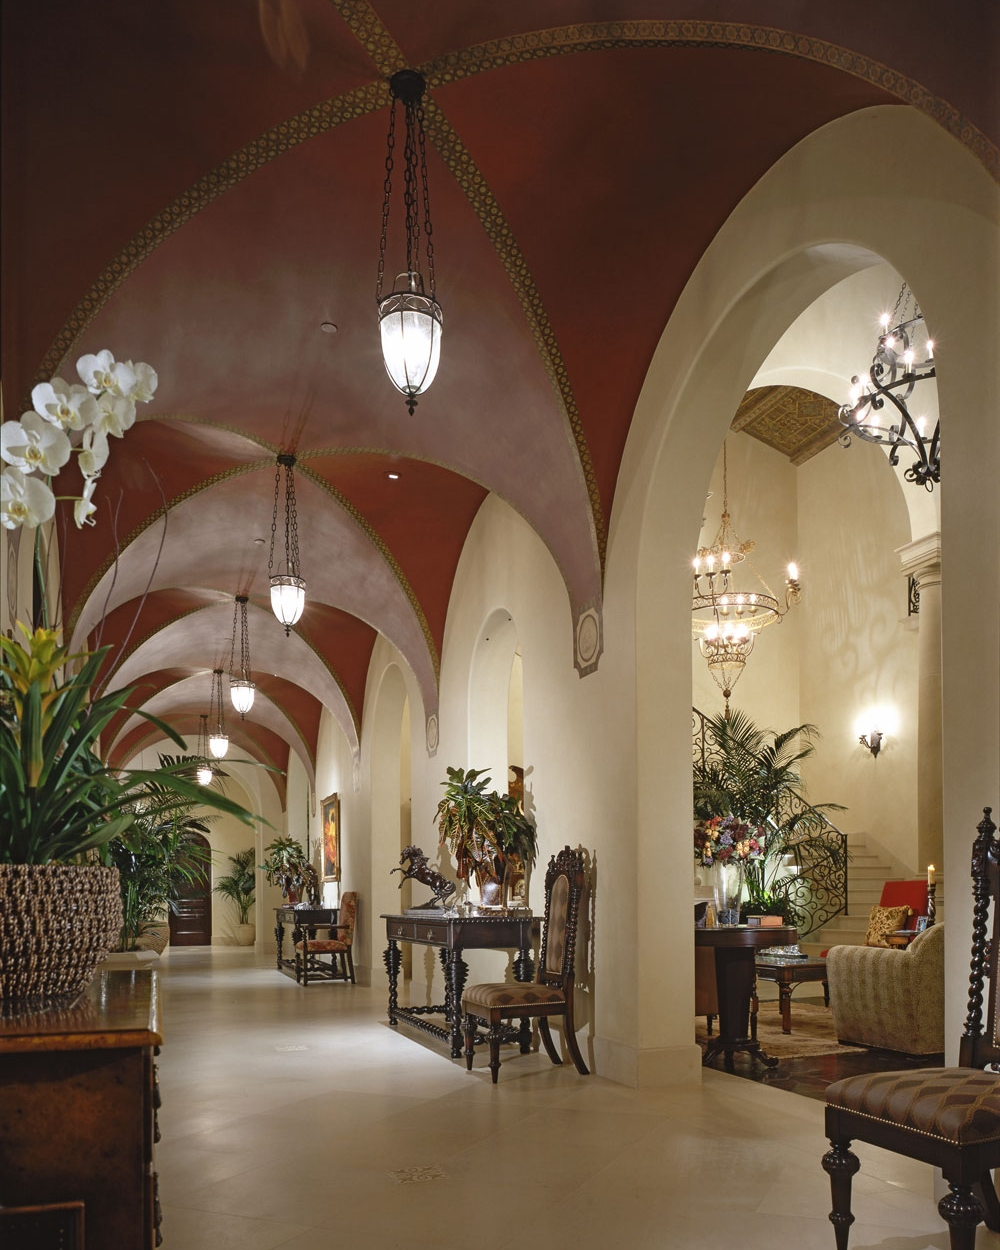 2-Dee-Carawan-groin-vaulted-hallway.jpg